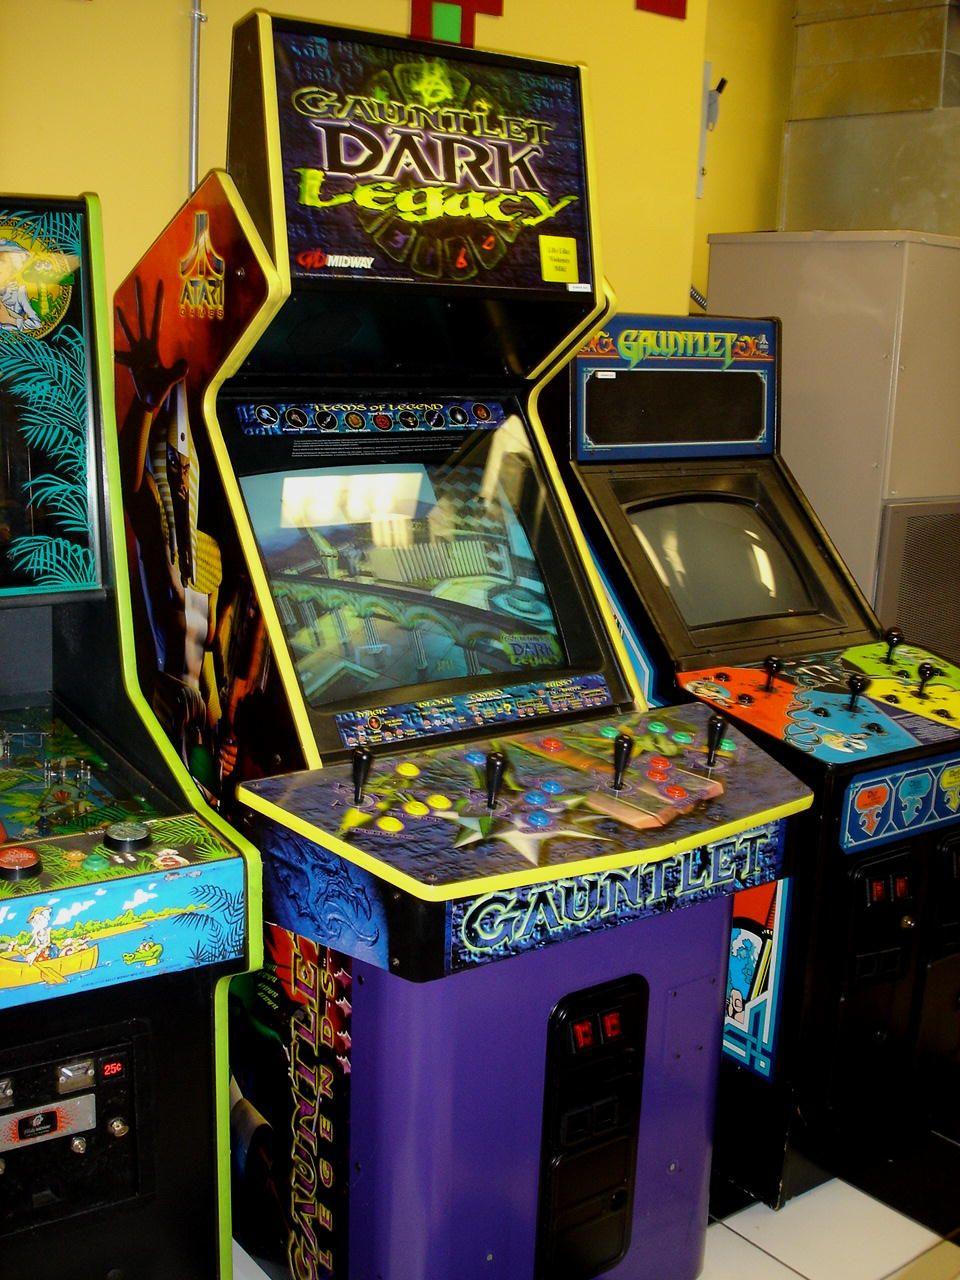 Gauntlet Legends Gauntlet Dark Legends Arcade Game Machines